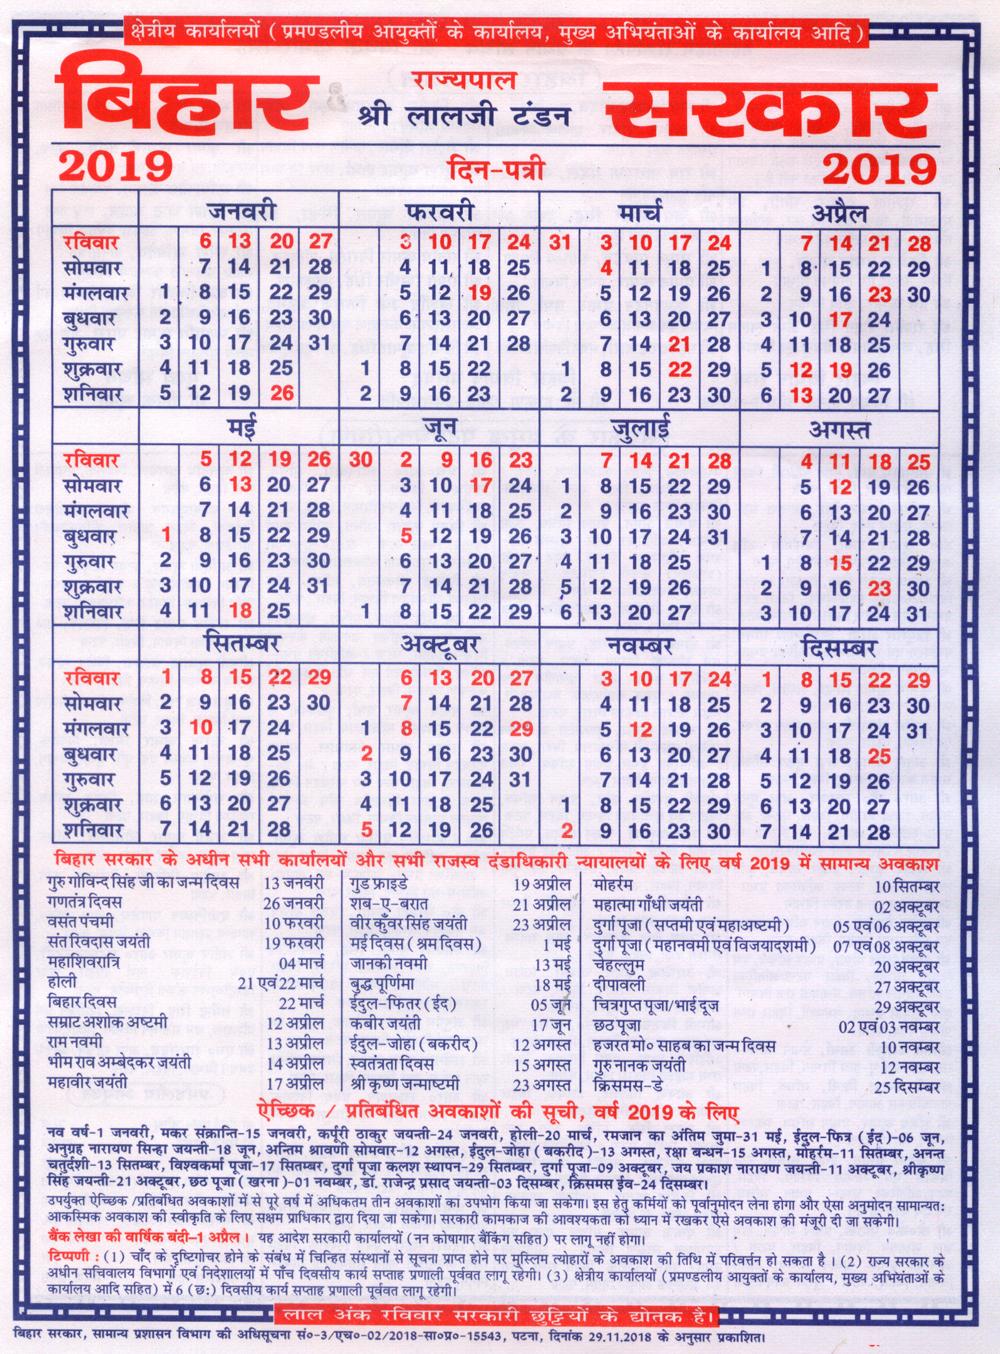 Bihar Govt Calendar 2020 Pdf | Calendar For Planning within Calendar 2018 Bihar Sarkar